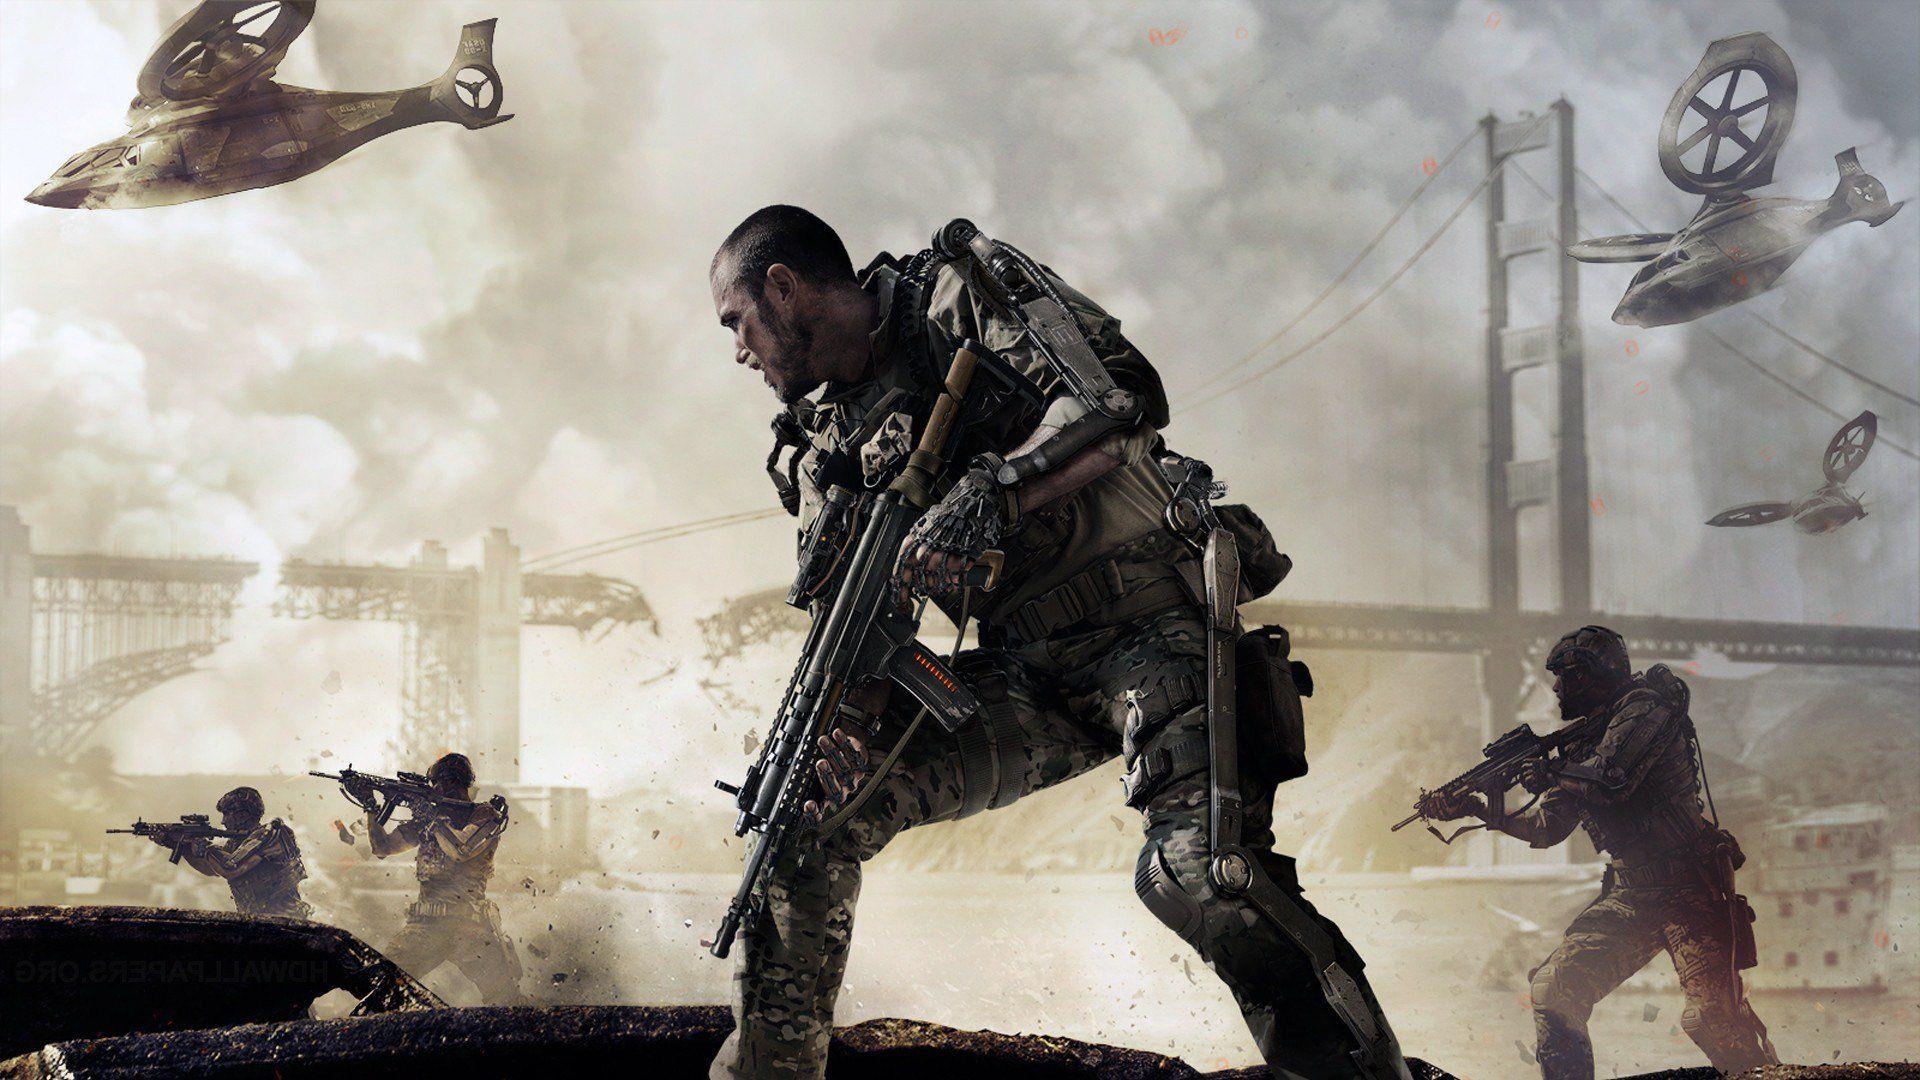 Call Of Duty Advanced Warfare Hd Desktop Wallpaper High Hd